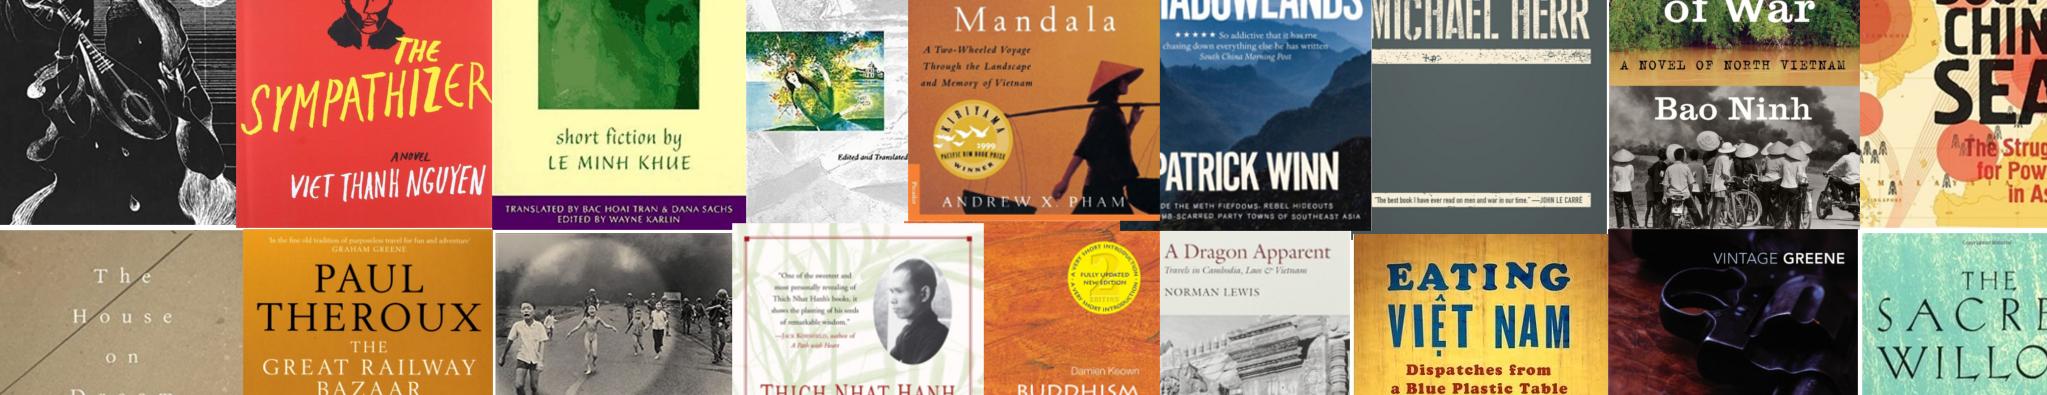 Vietnam Reading List & Book Reviews